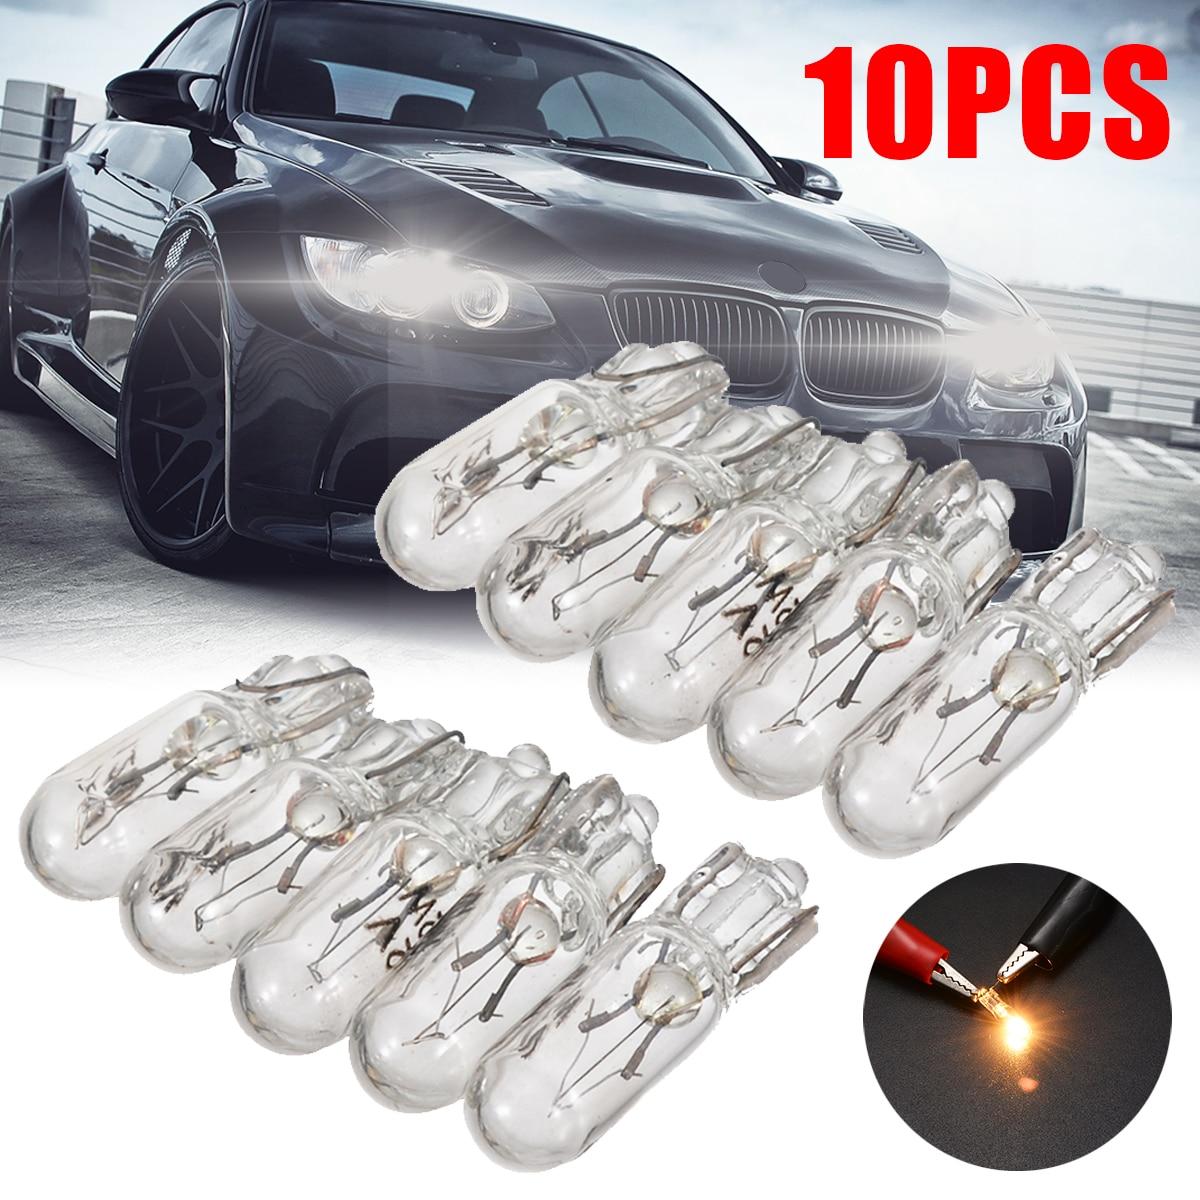 New Arrival 10pcs 12V 1.2W T5 286 Glass Amber Light Blub Car Wedge Dashboard Instrument Panel Brake Light Bulbs